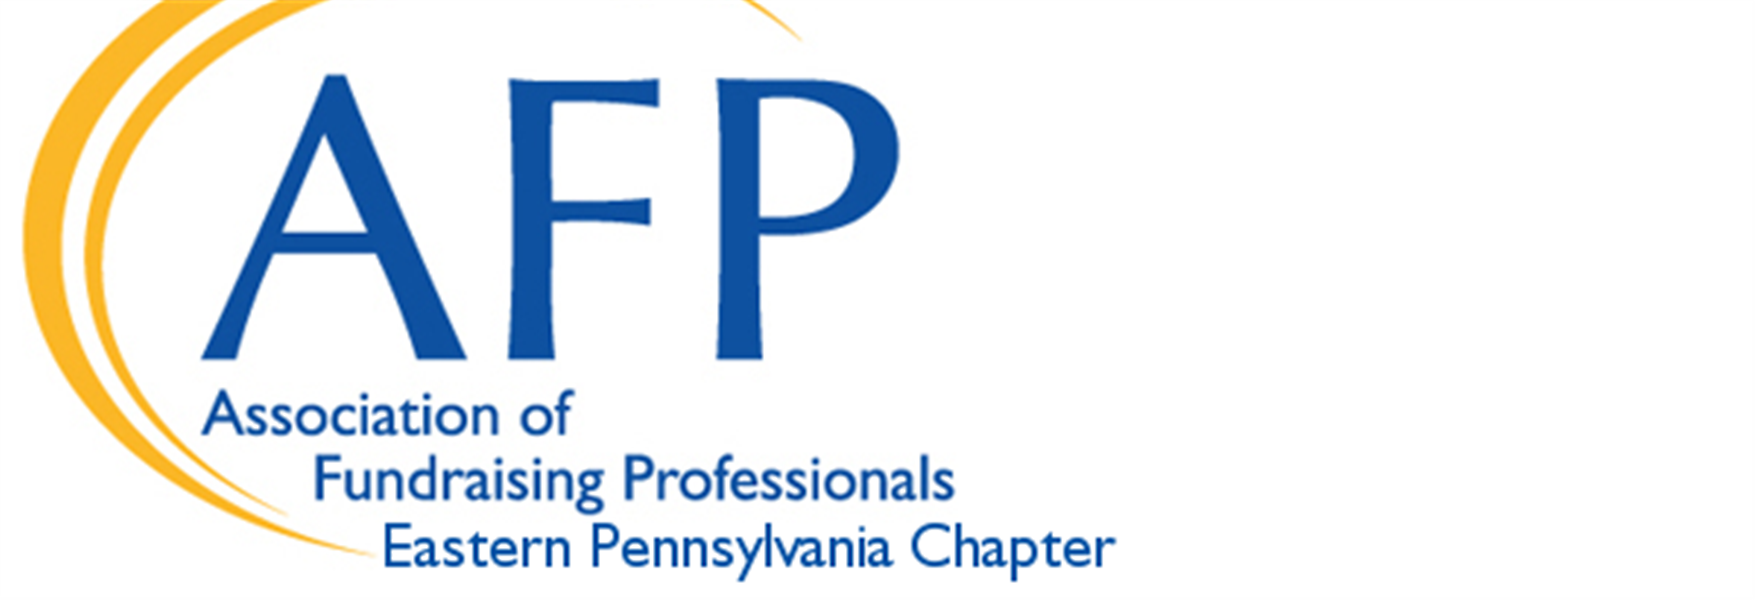 08a2ff81-9335-4898-ae56-22aa5a6b03d4_AFP - EPA Logo.php.png